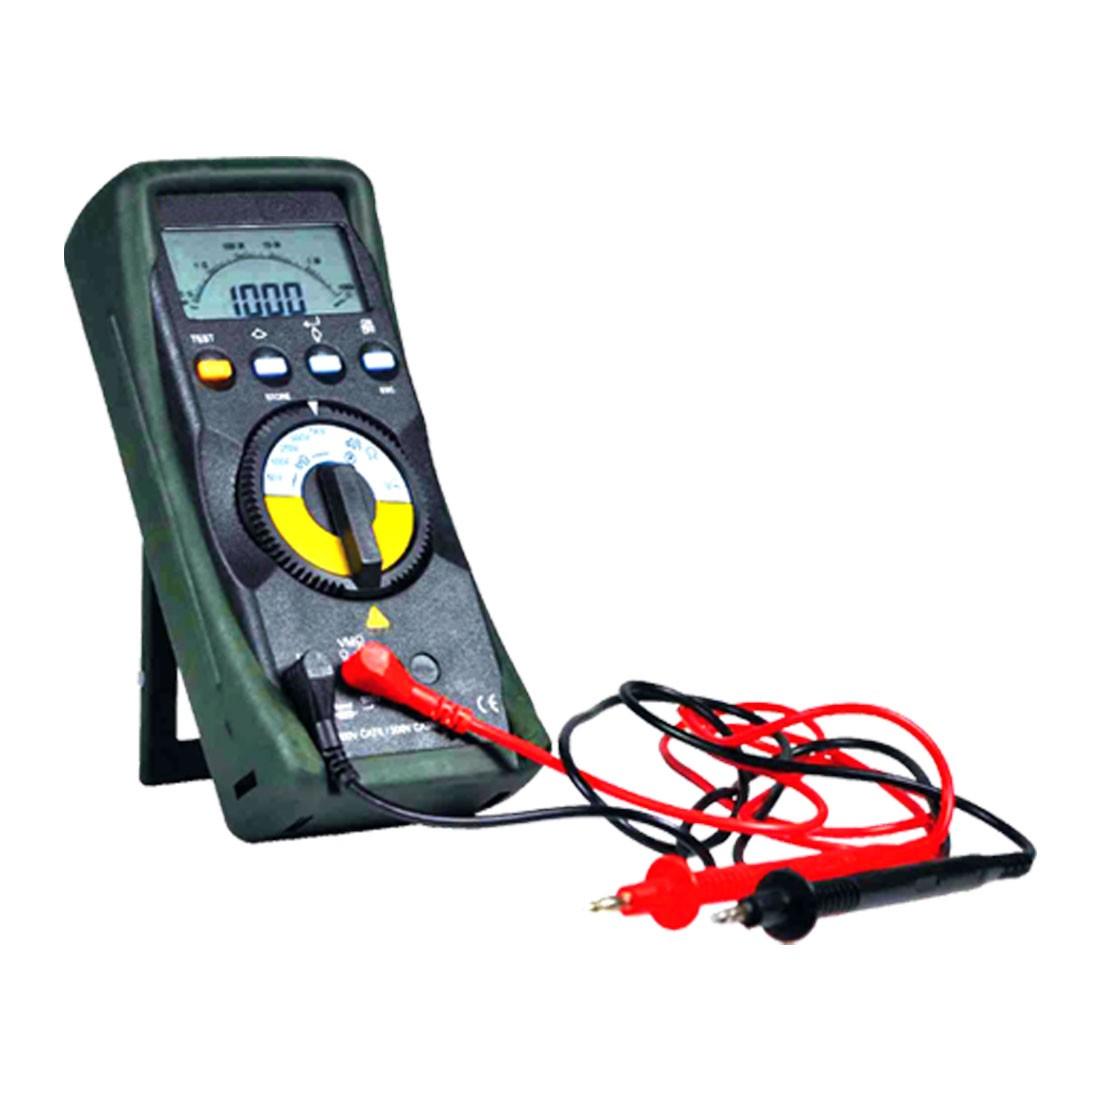 Zeta 20 Handheld Digital Insulation and Continuity Tester